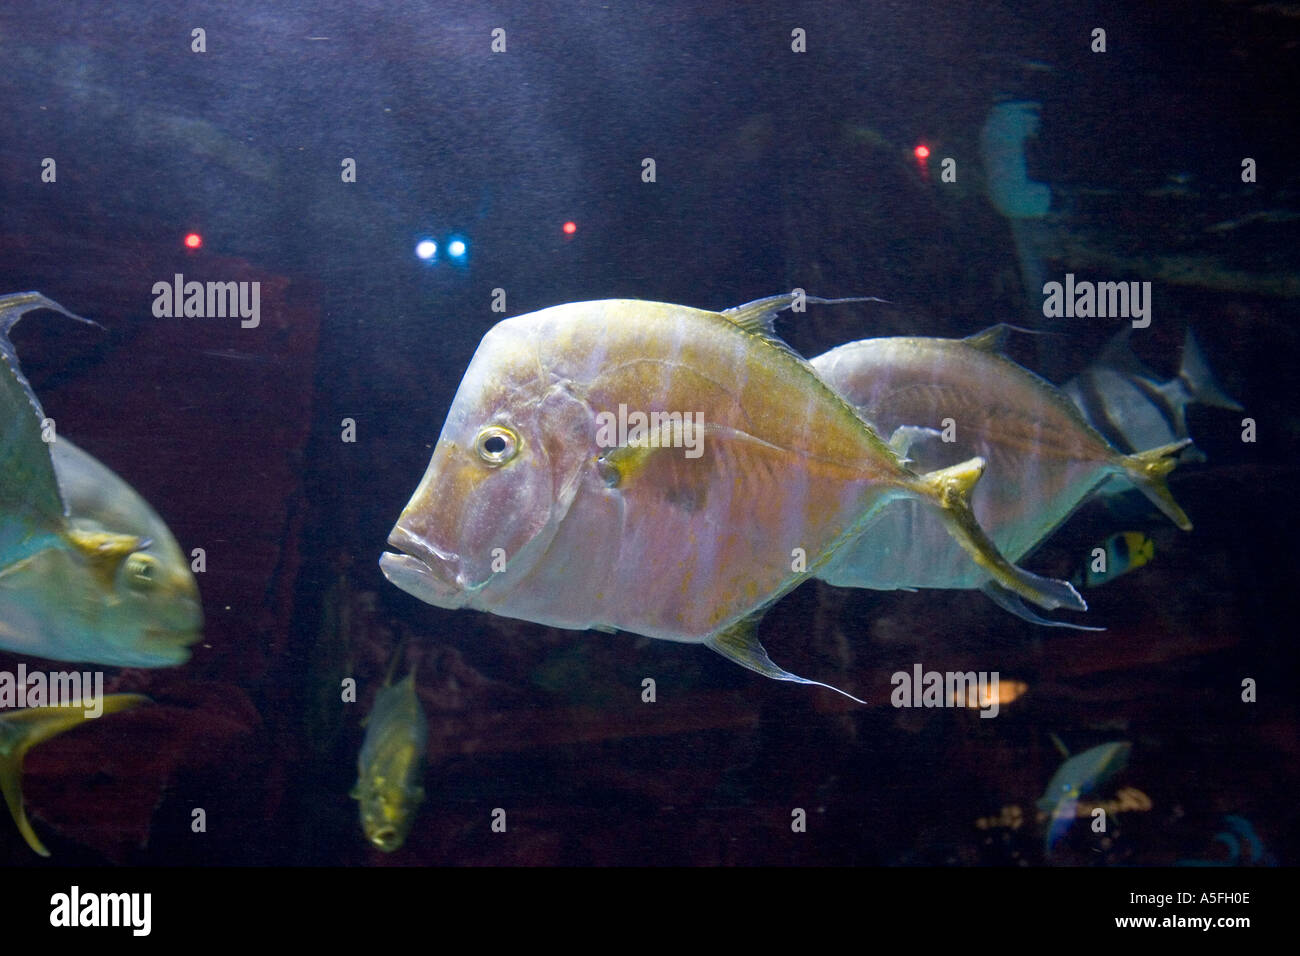 Big tropical fish in a giant tank las vegas casino nv for Tropical fish las vegas